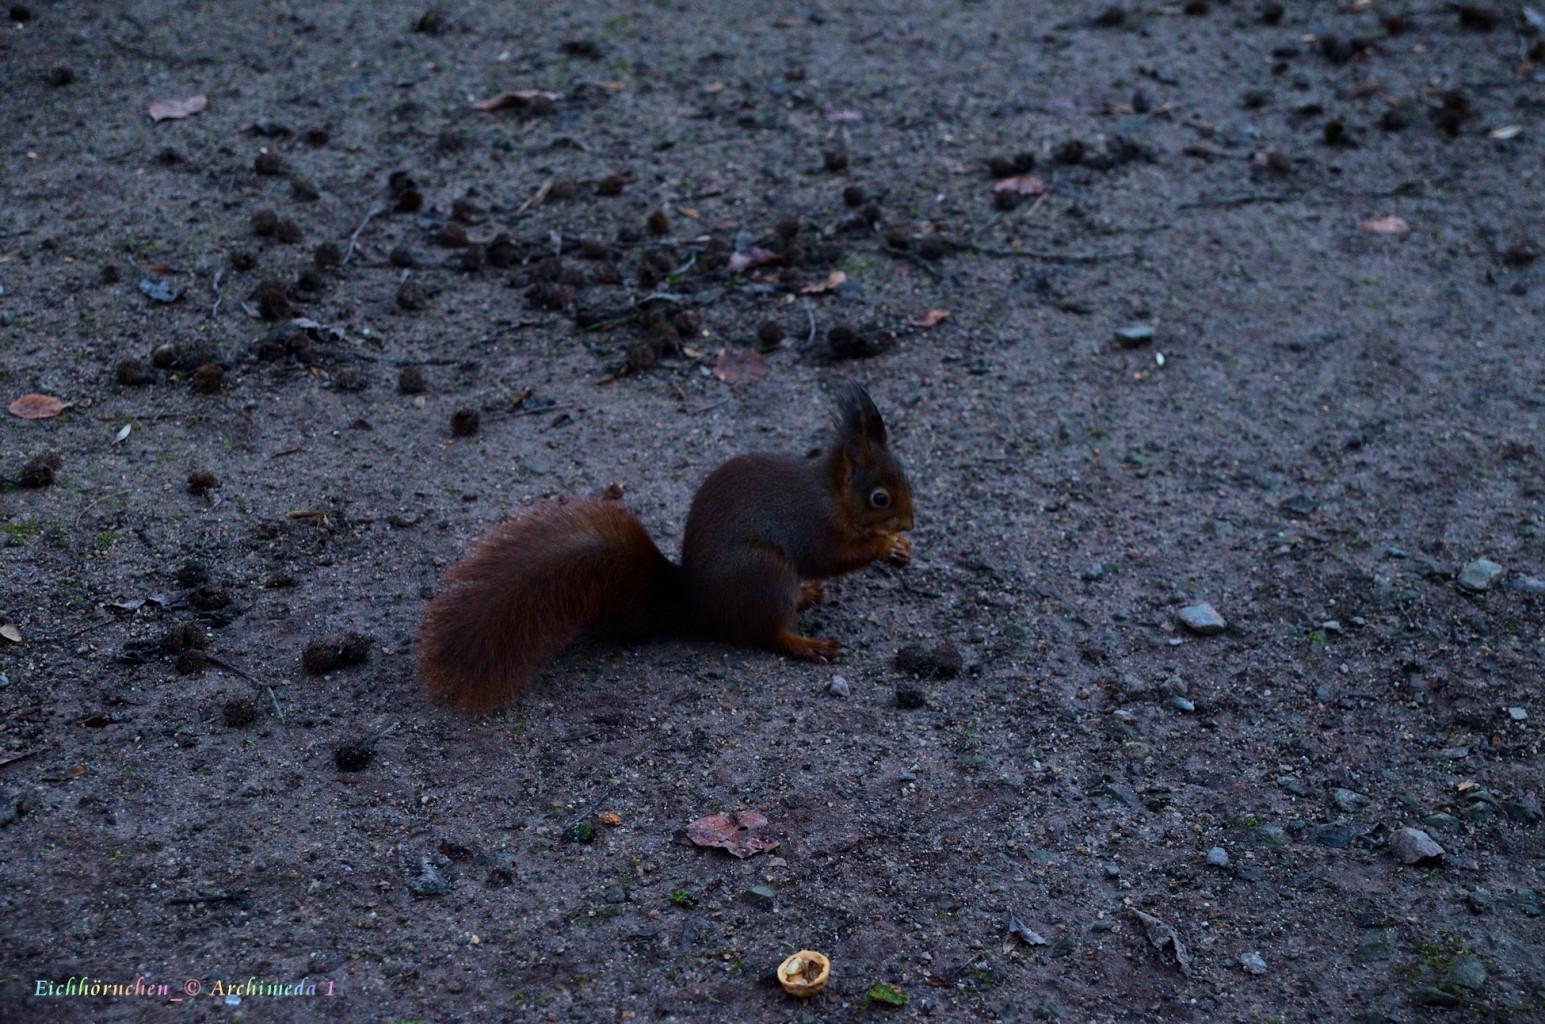 Eichhörnchen_© Archimeda 1